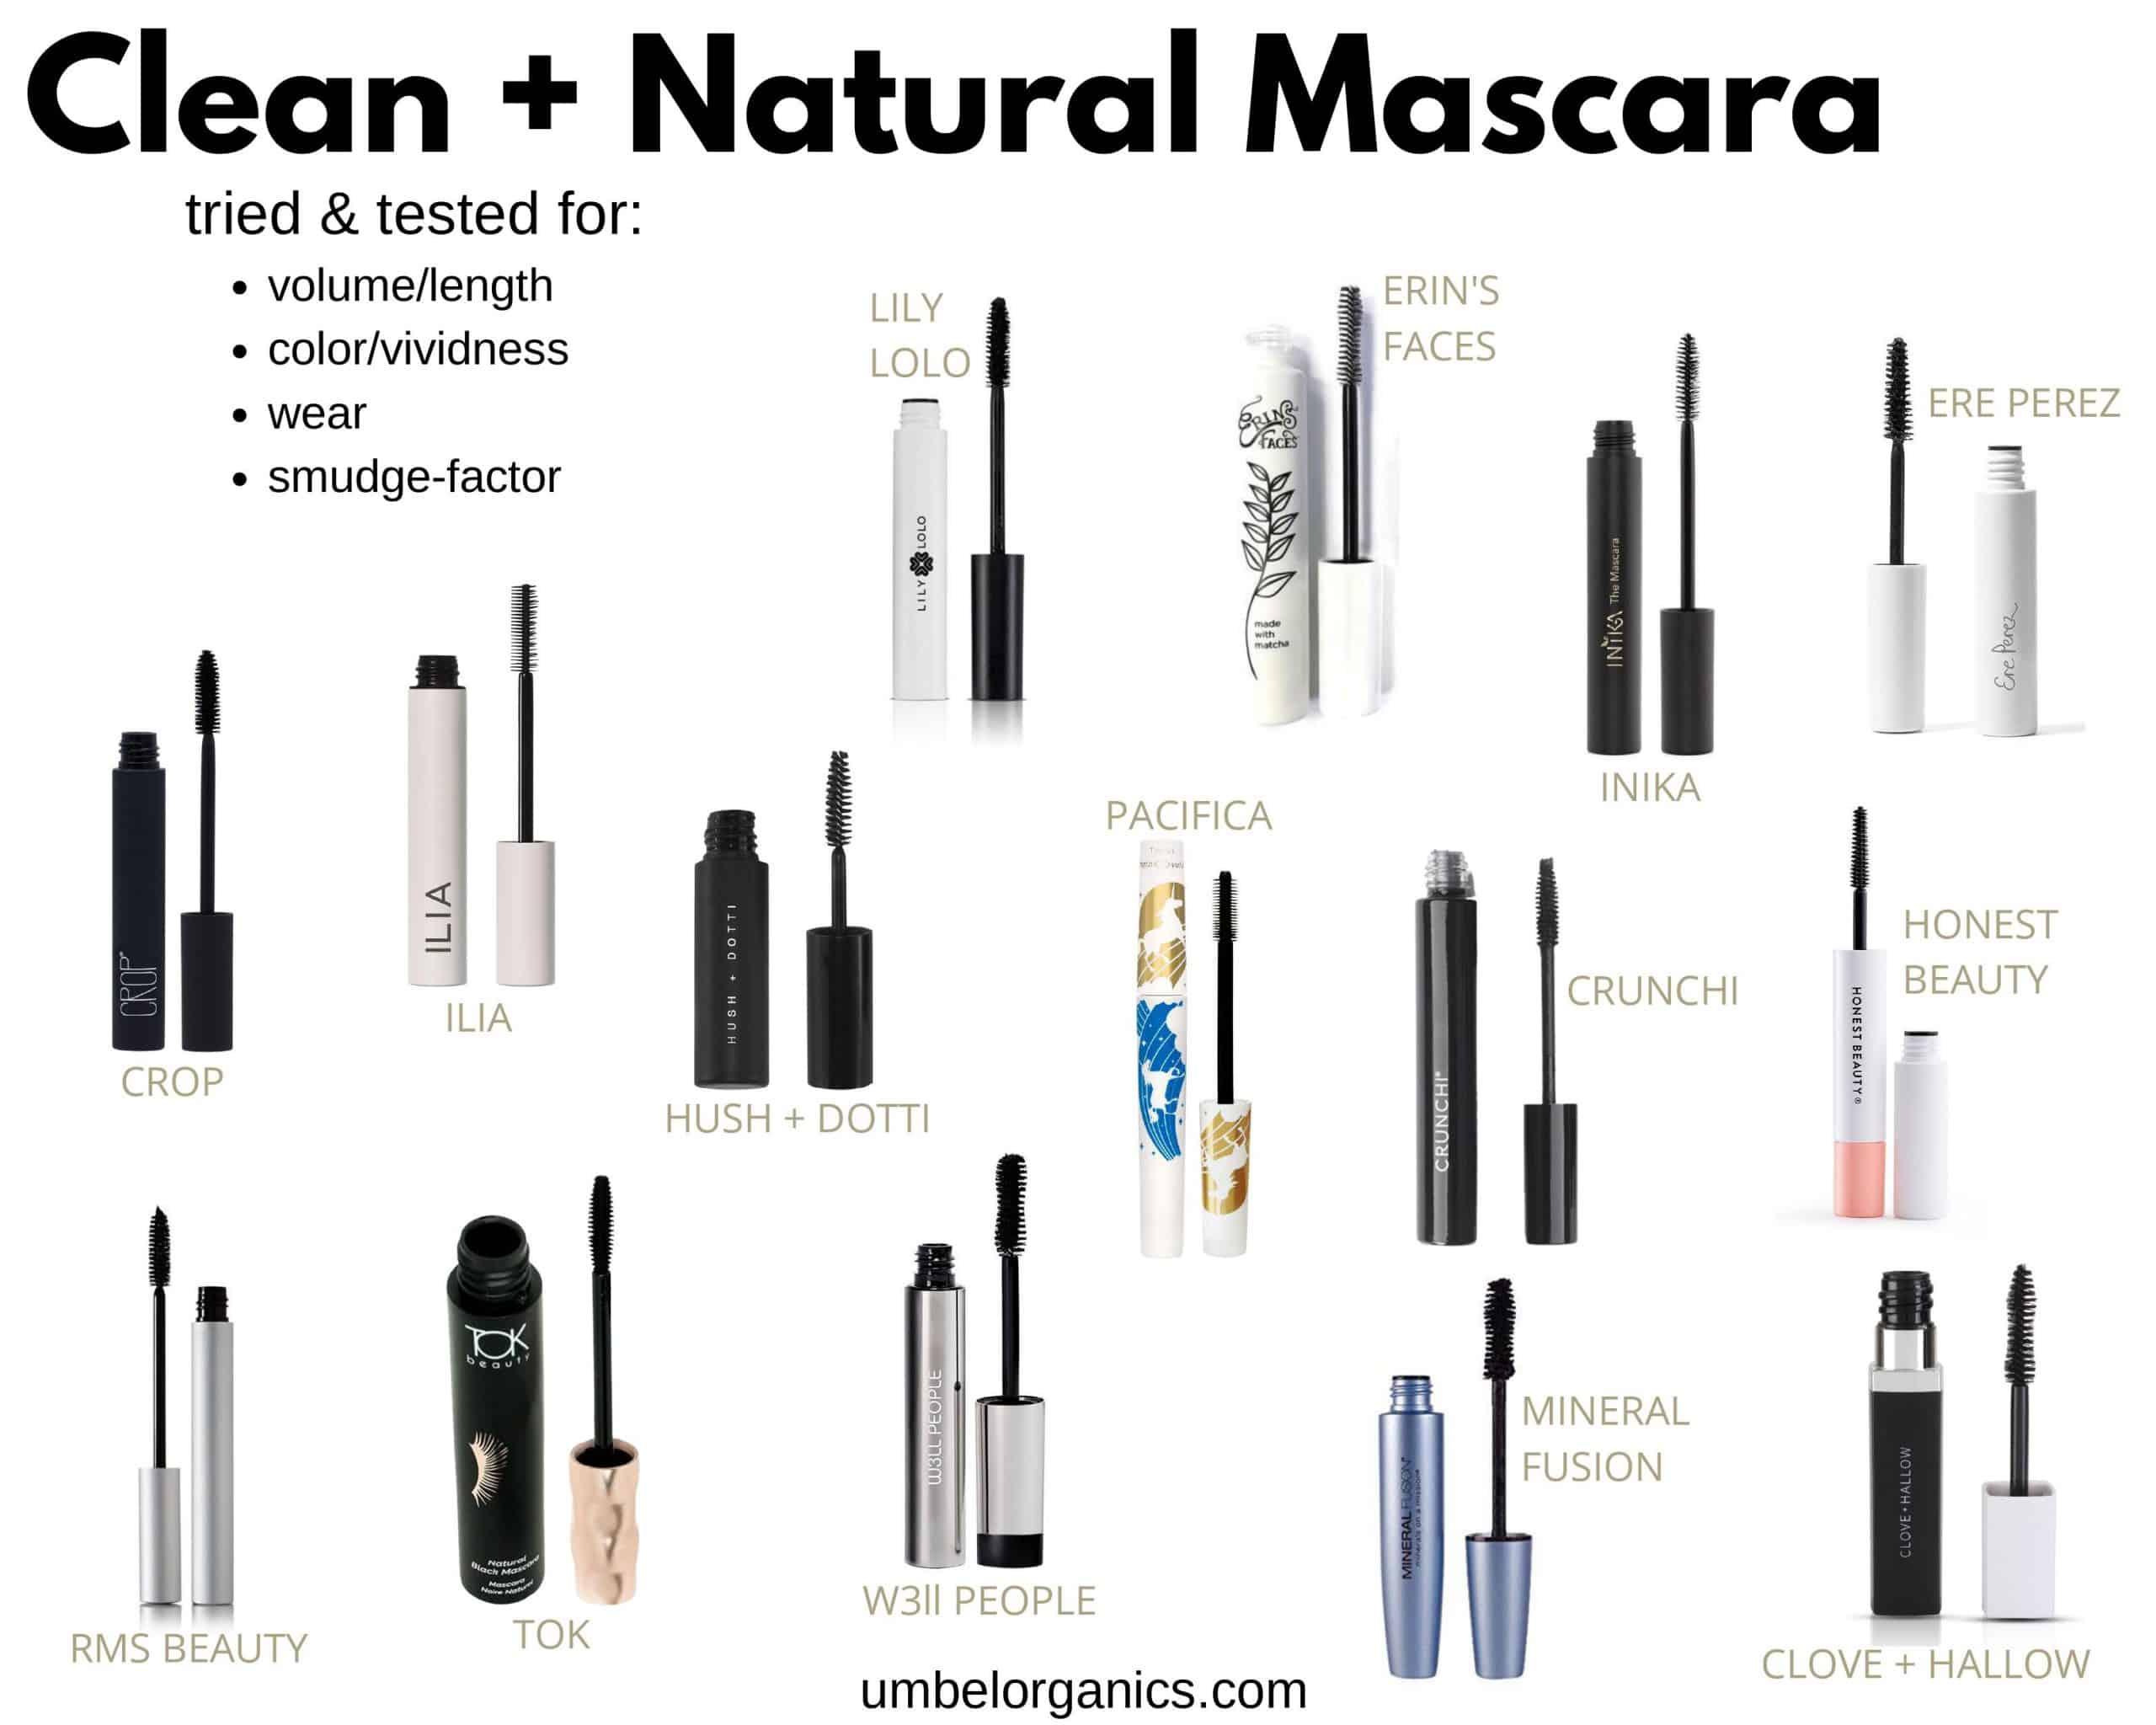 15 clean mascara brands